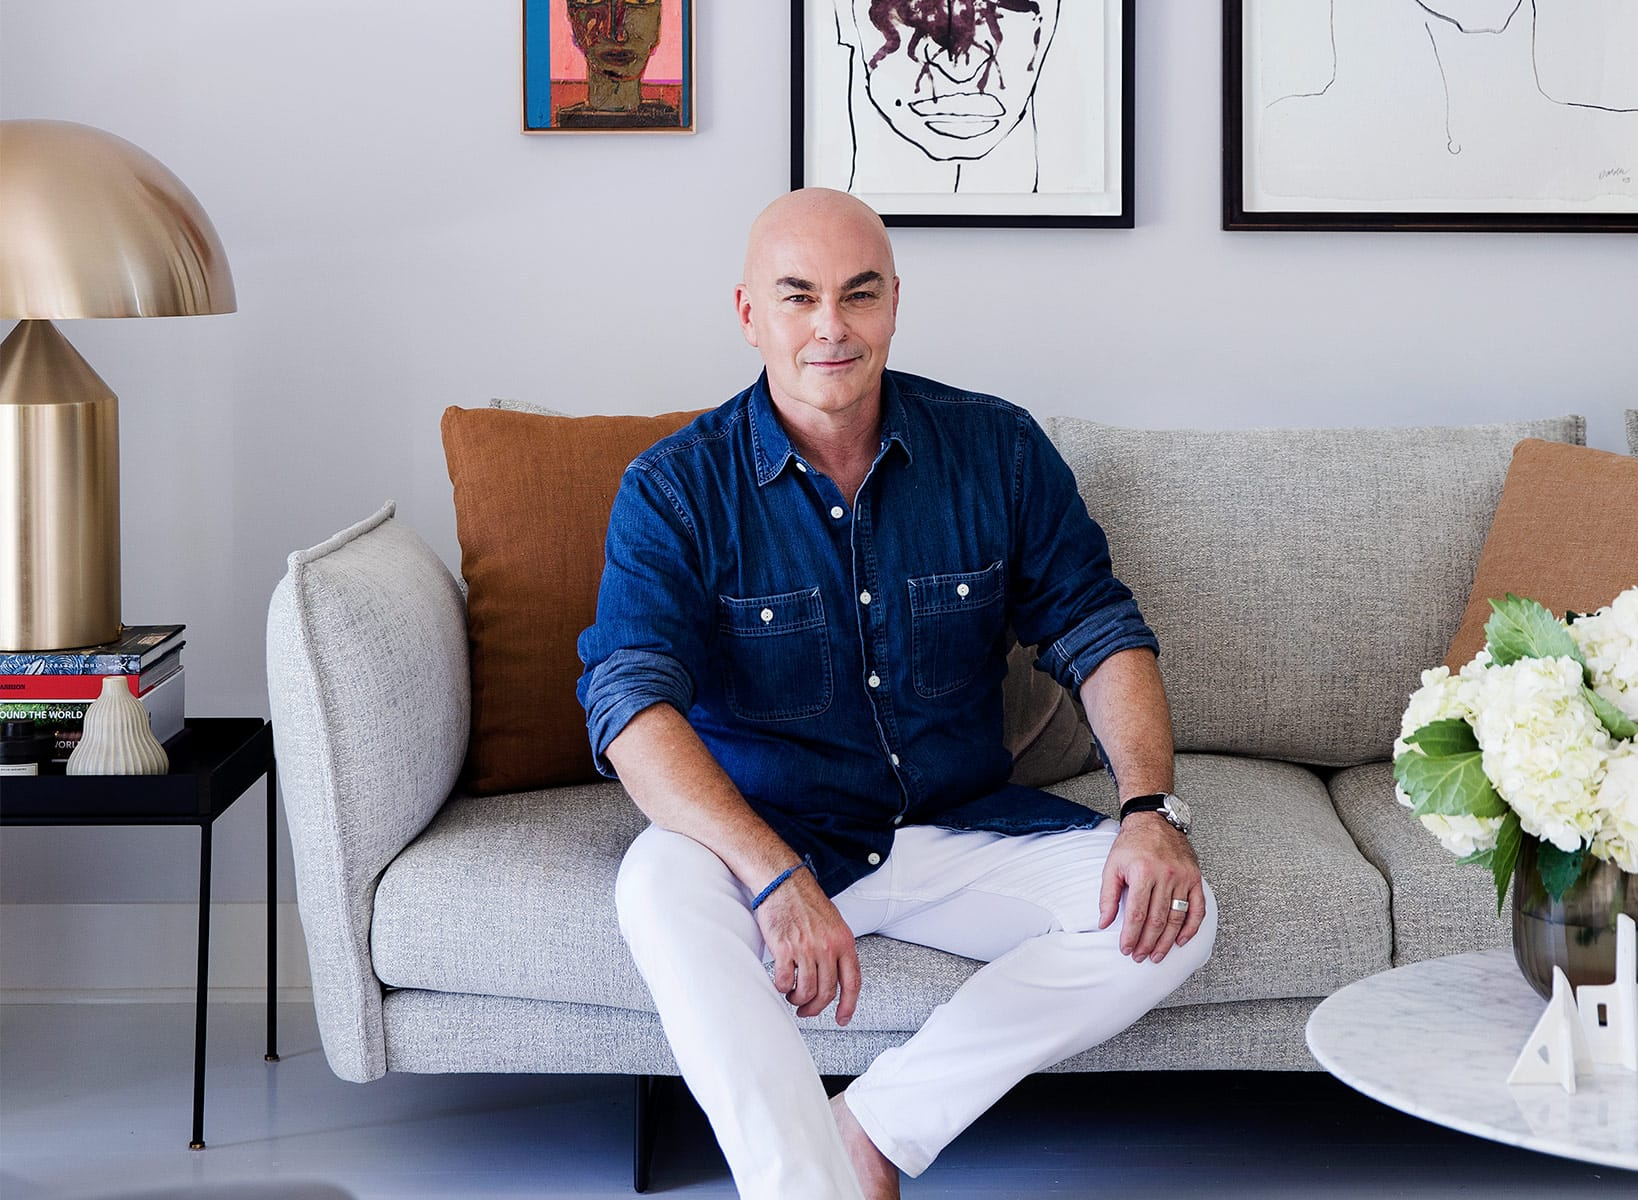 neale whitaker king living ambassador on grey sofa